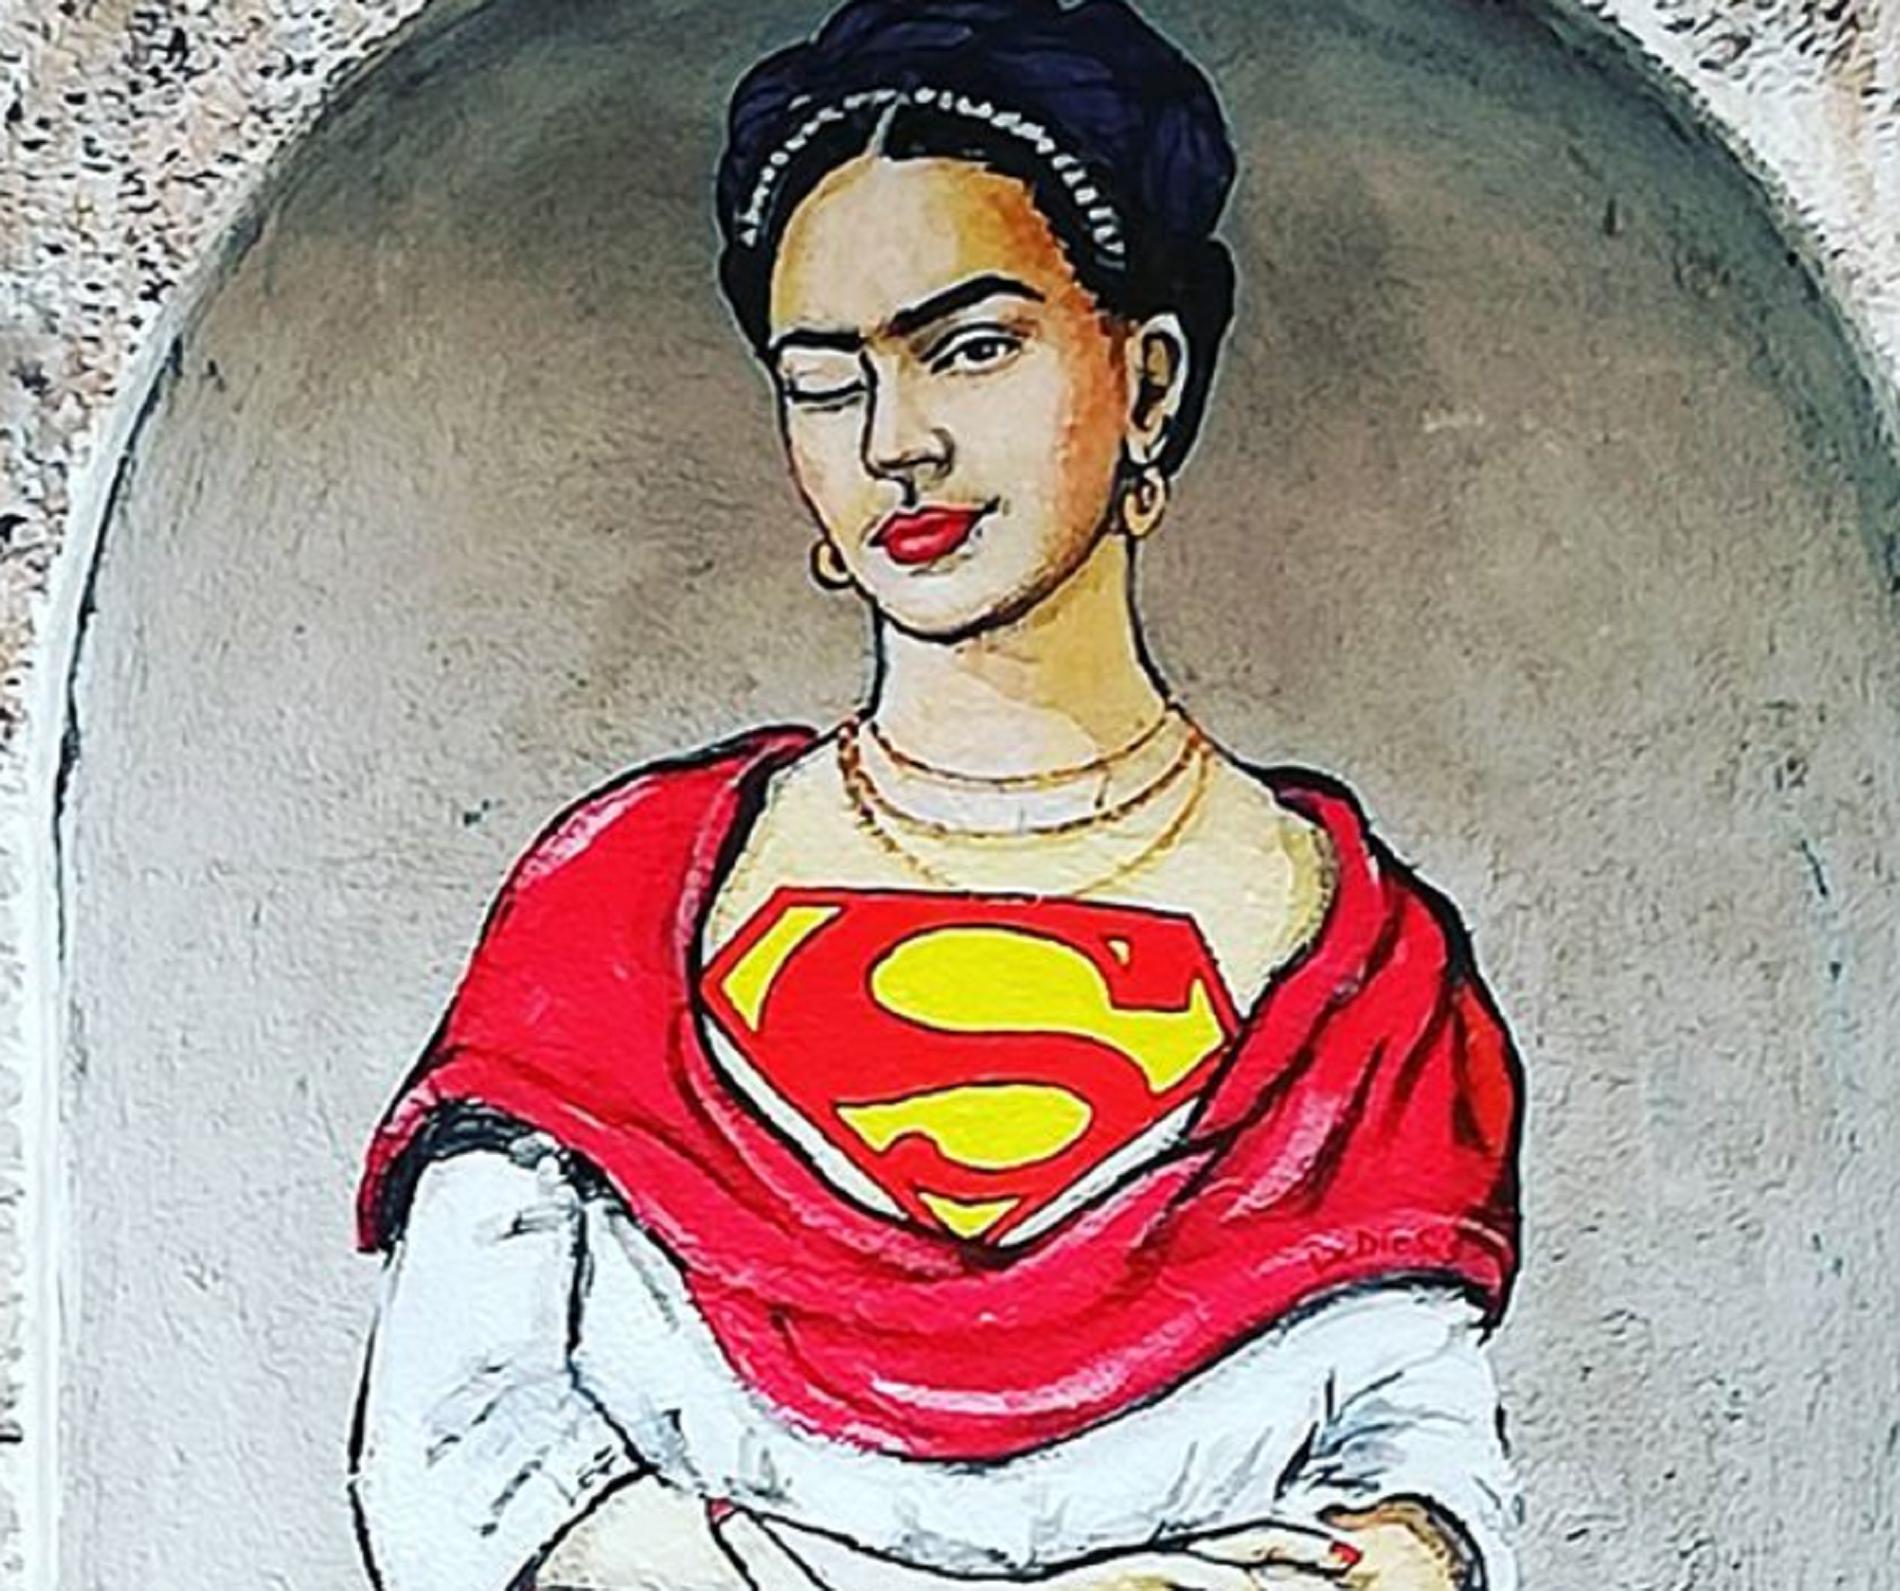 Da Anna Magnani a Frida Kahlo. Dopo Firenze, le misteriose Superwoman arrivano a Roma